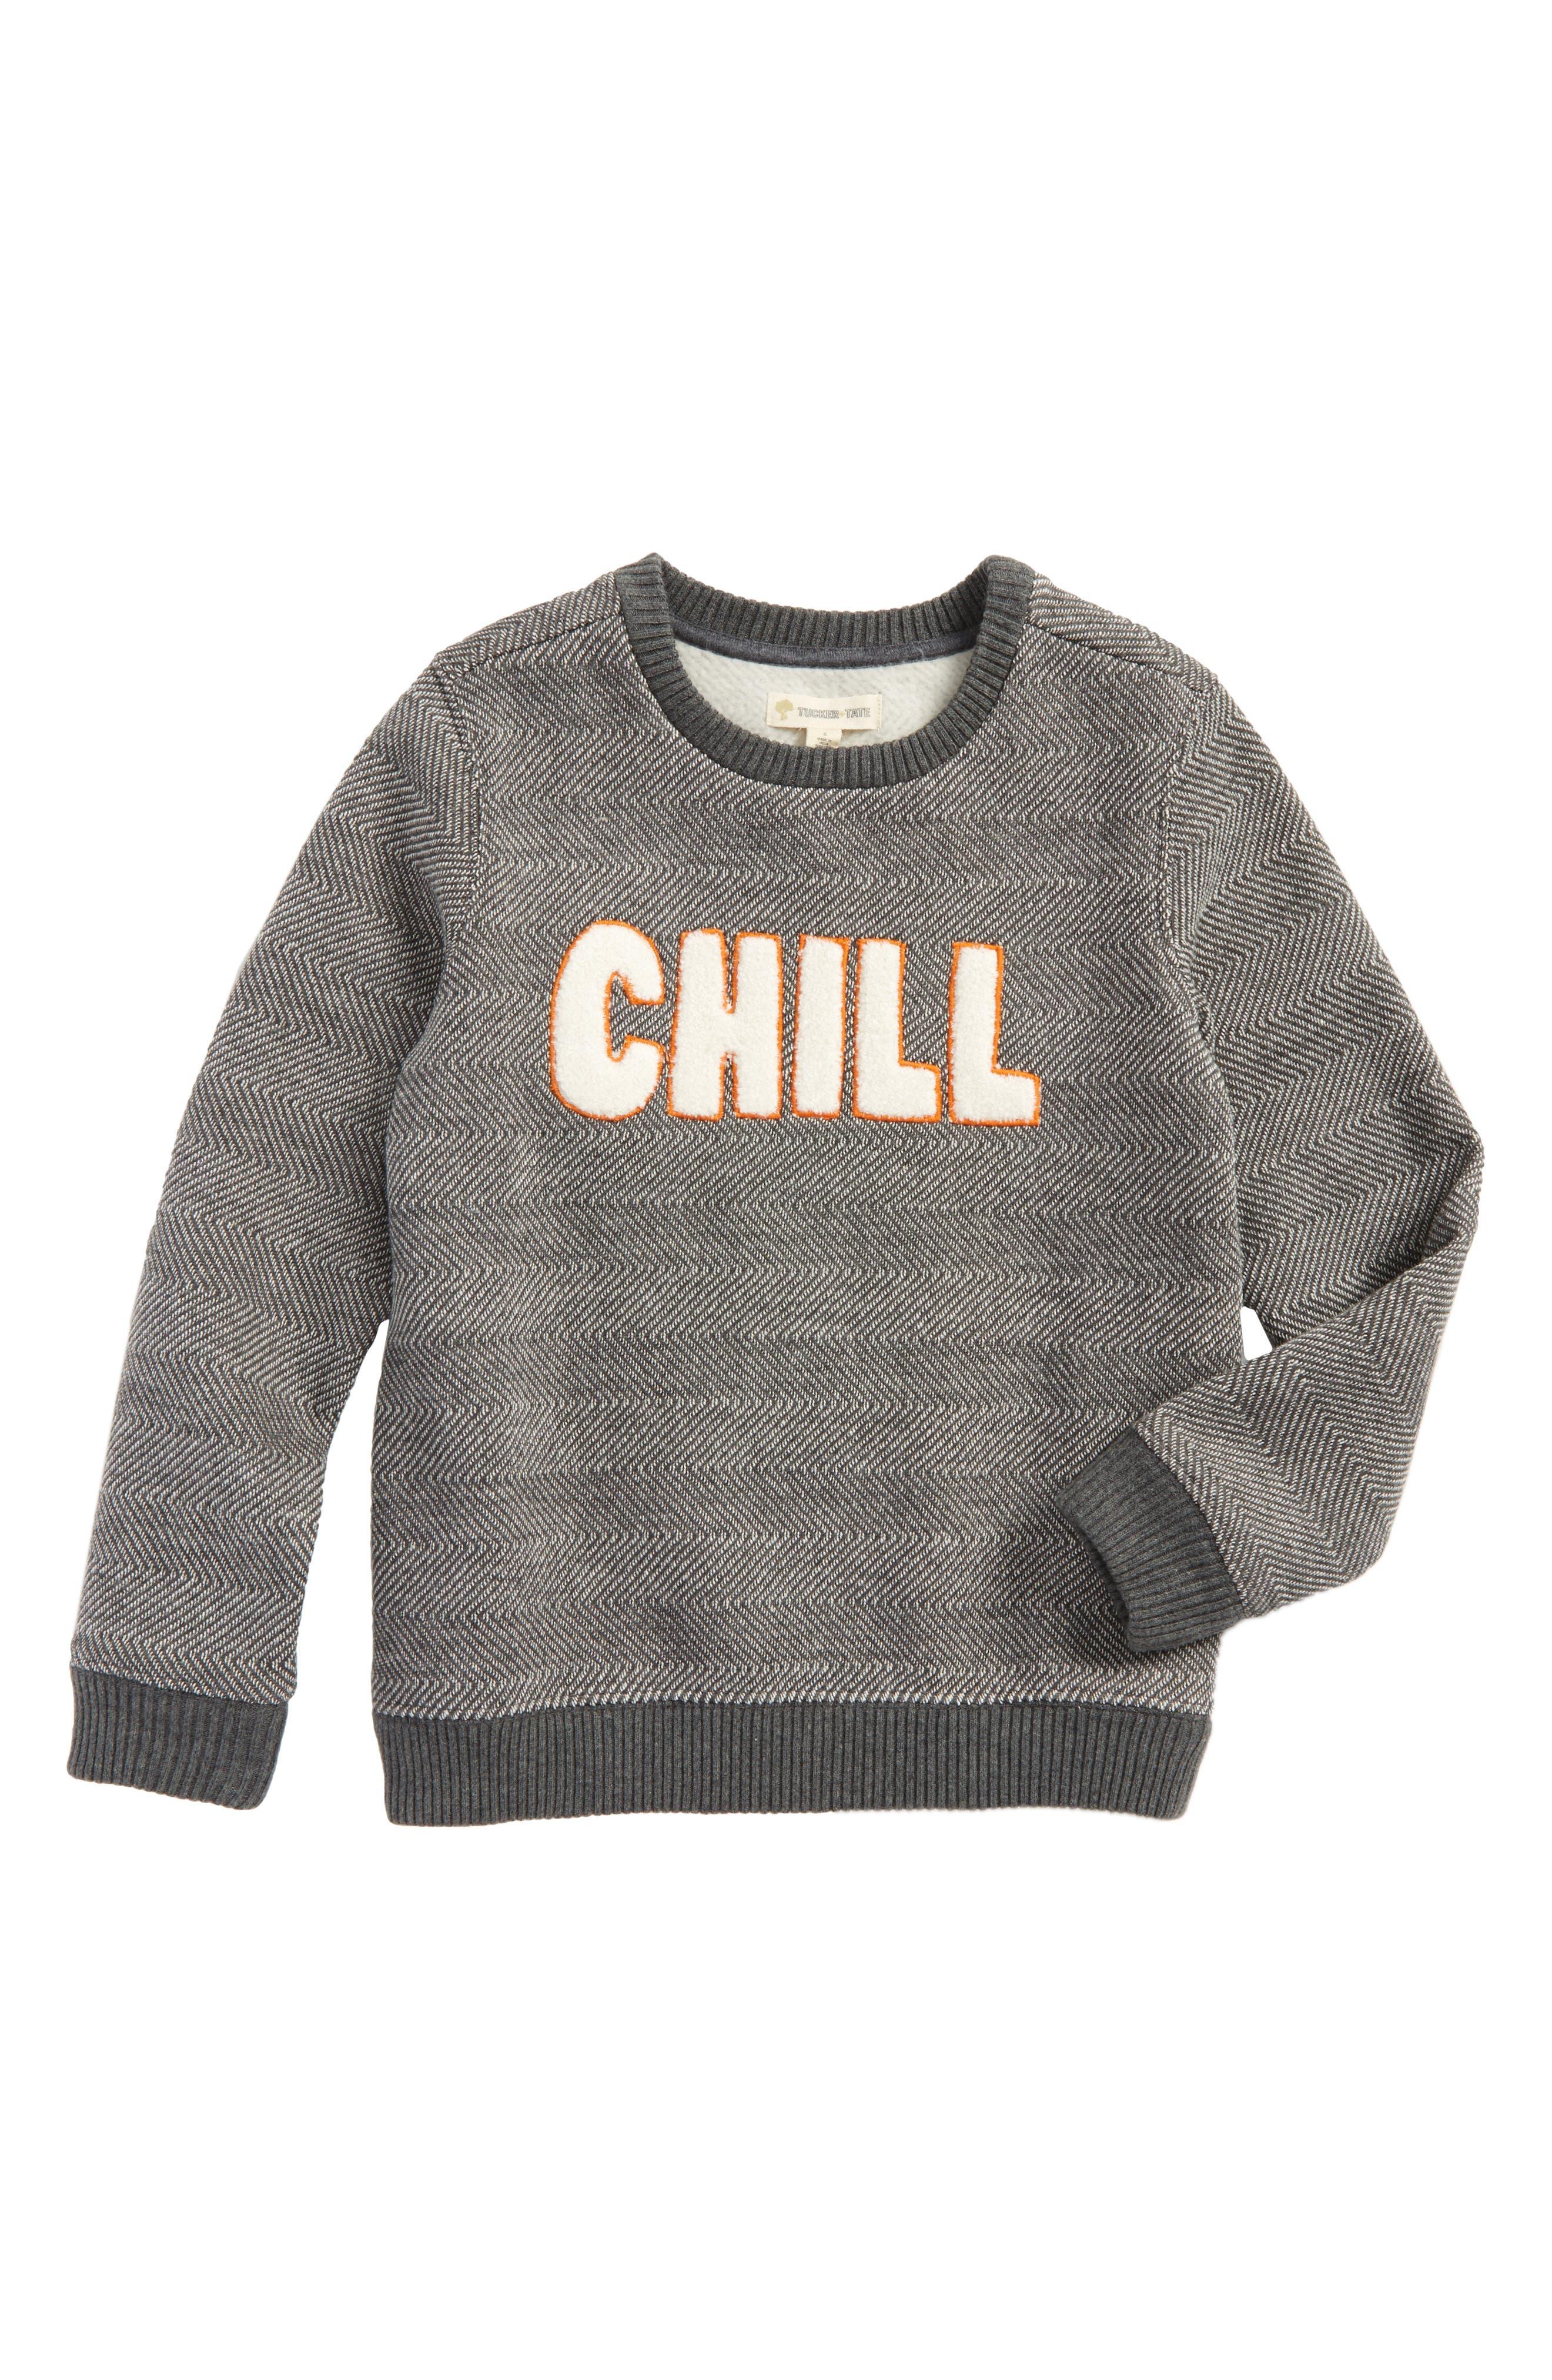 Fleece Sweatshirt,                             Main thumbnail 1, color,                             Grey Castlerock Chill